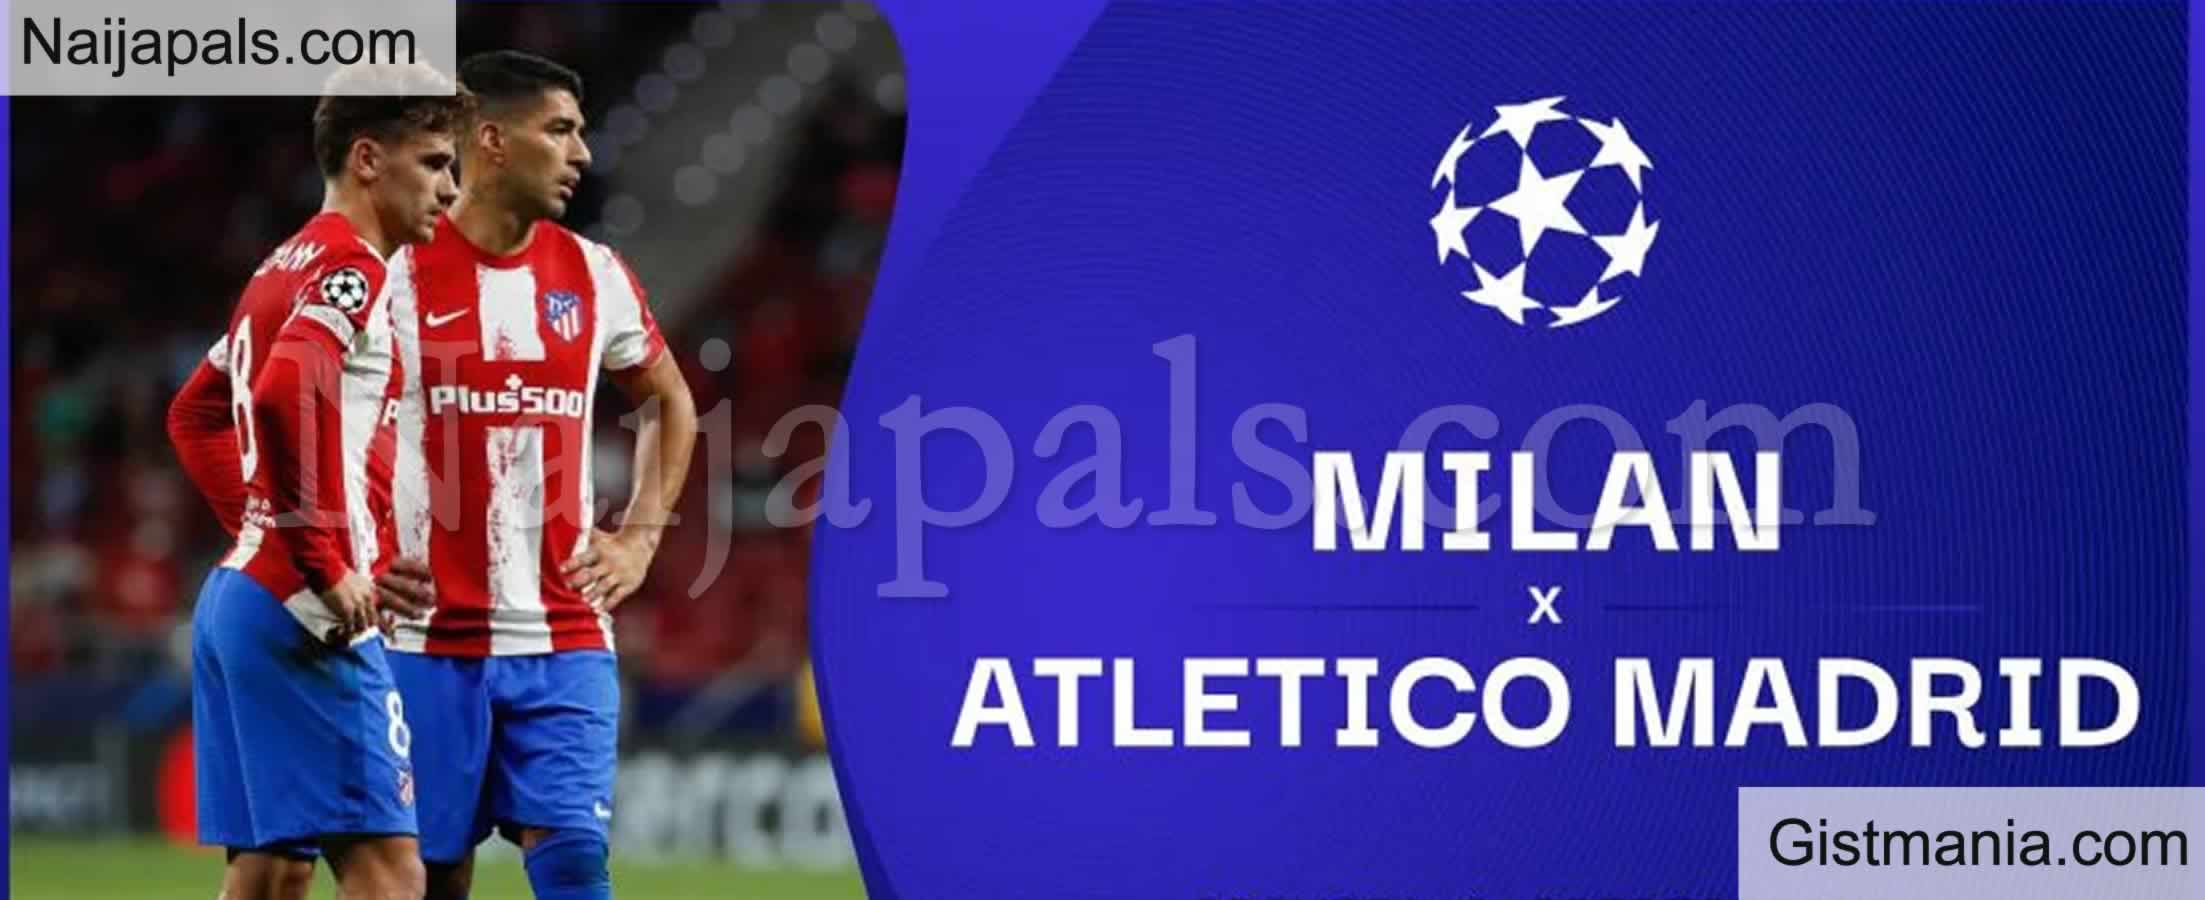 <img alt='.' class='lazyload' data-src='https://img.gistmania.com/emot/soccer.gif' /> <b>AC Milan v Atletico Madrid : UEFA Champion's League Match, Team News, Goal Scorers and Stats</b>